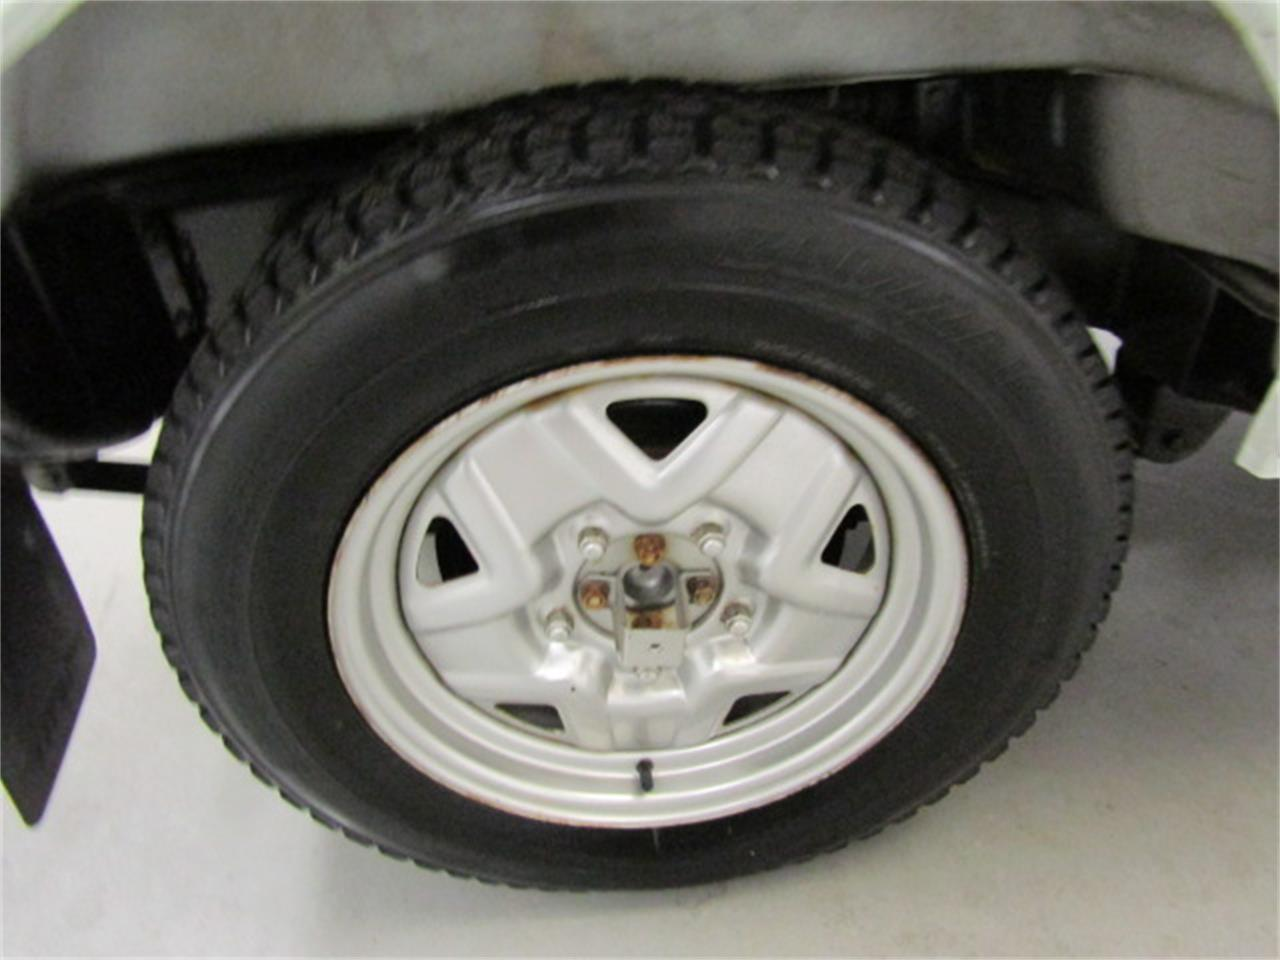 Large Picture of 1987 Suzuki Jimmy - $3,999.00 - JM3N